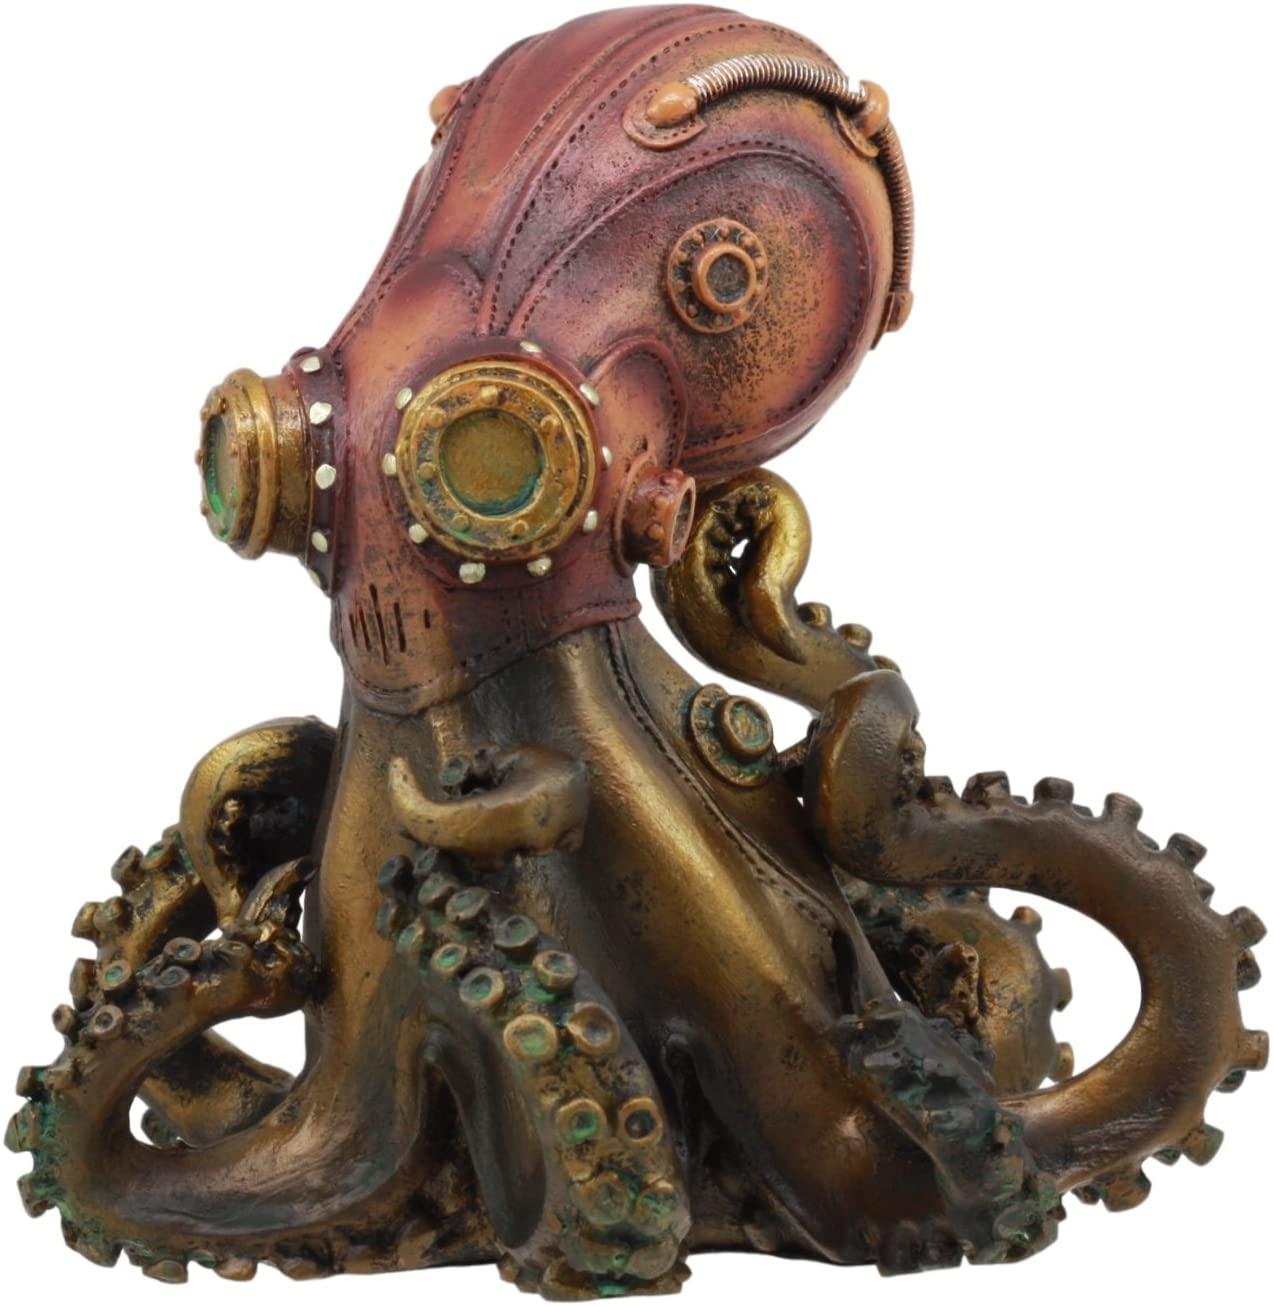 Steampunk Giant Kraken Octopus Marauder Statue steampunk collectibles